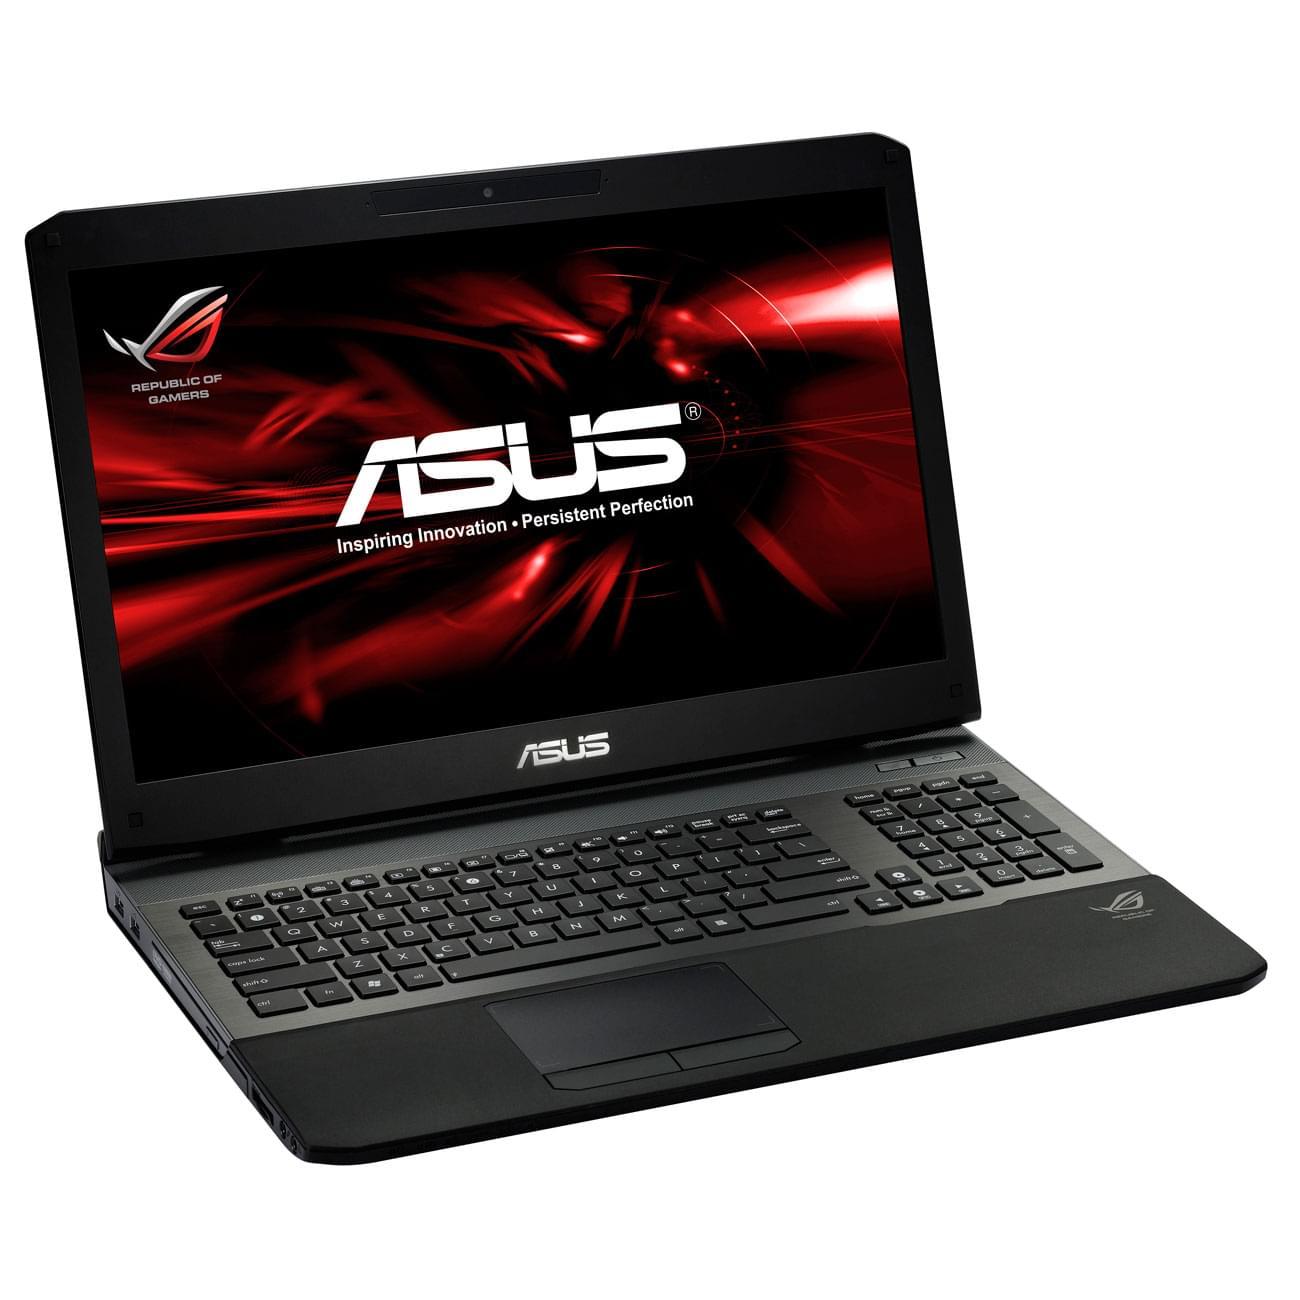 Asus G75VW-T1380H - PC portable Asus - Cybertek.fr - 0